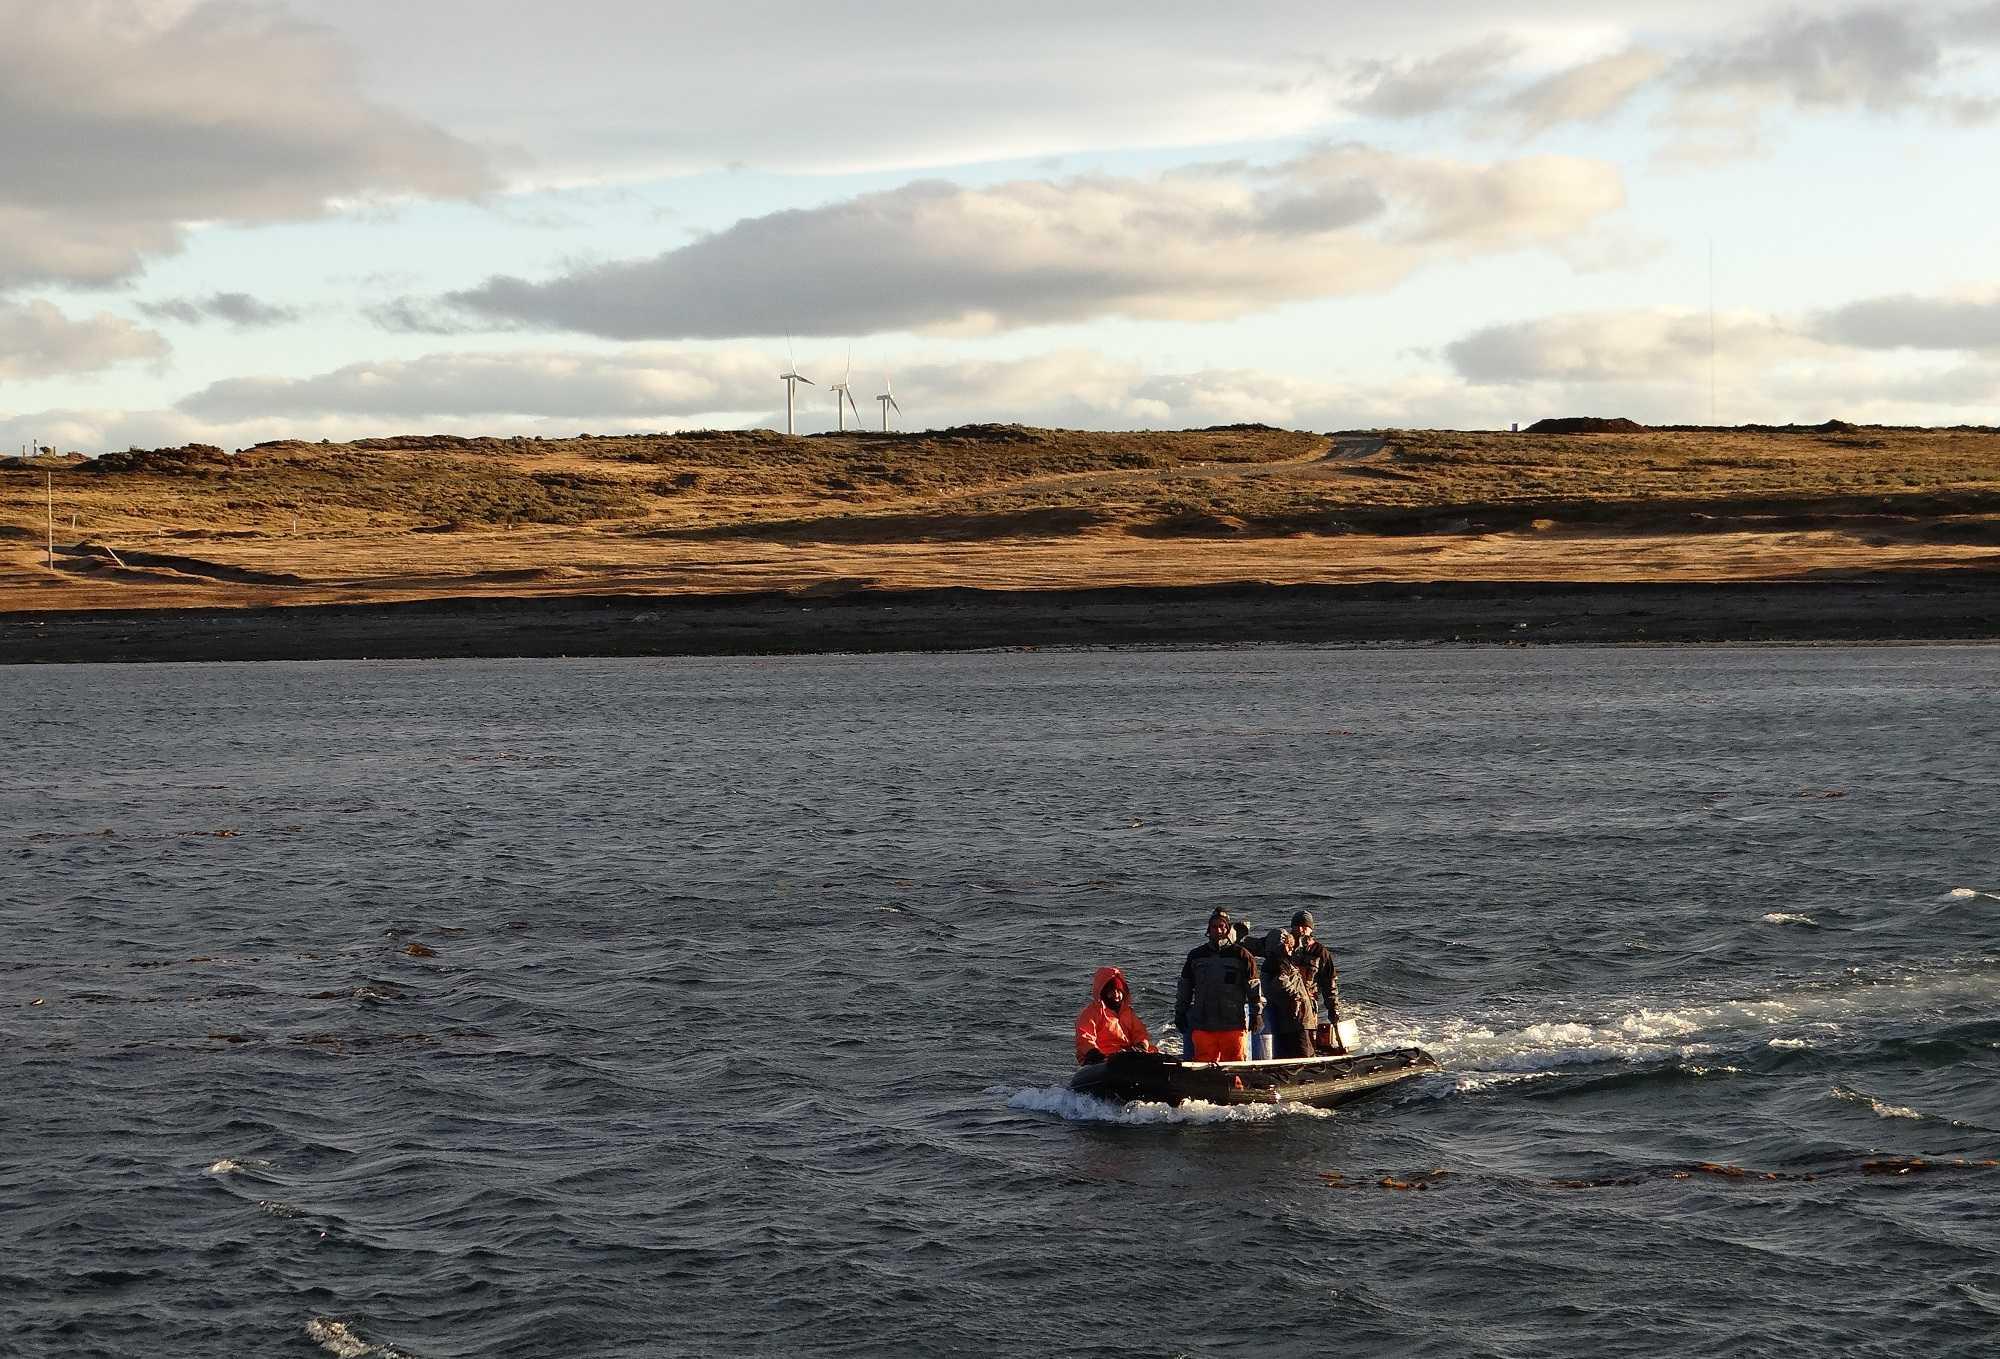 Estrecho de Magallanes - MERIC (2)